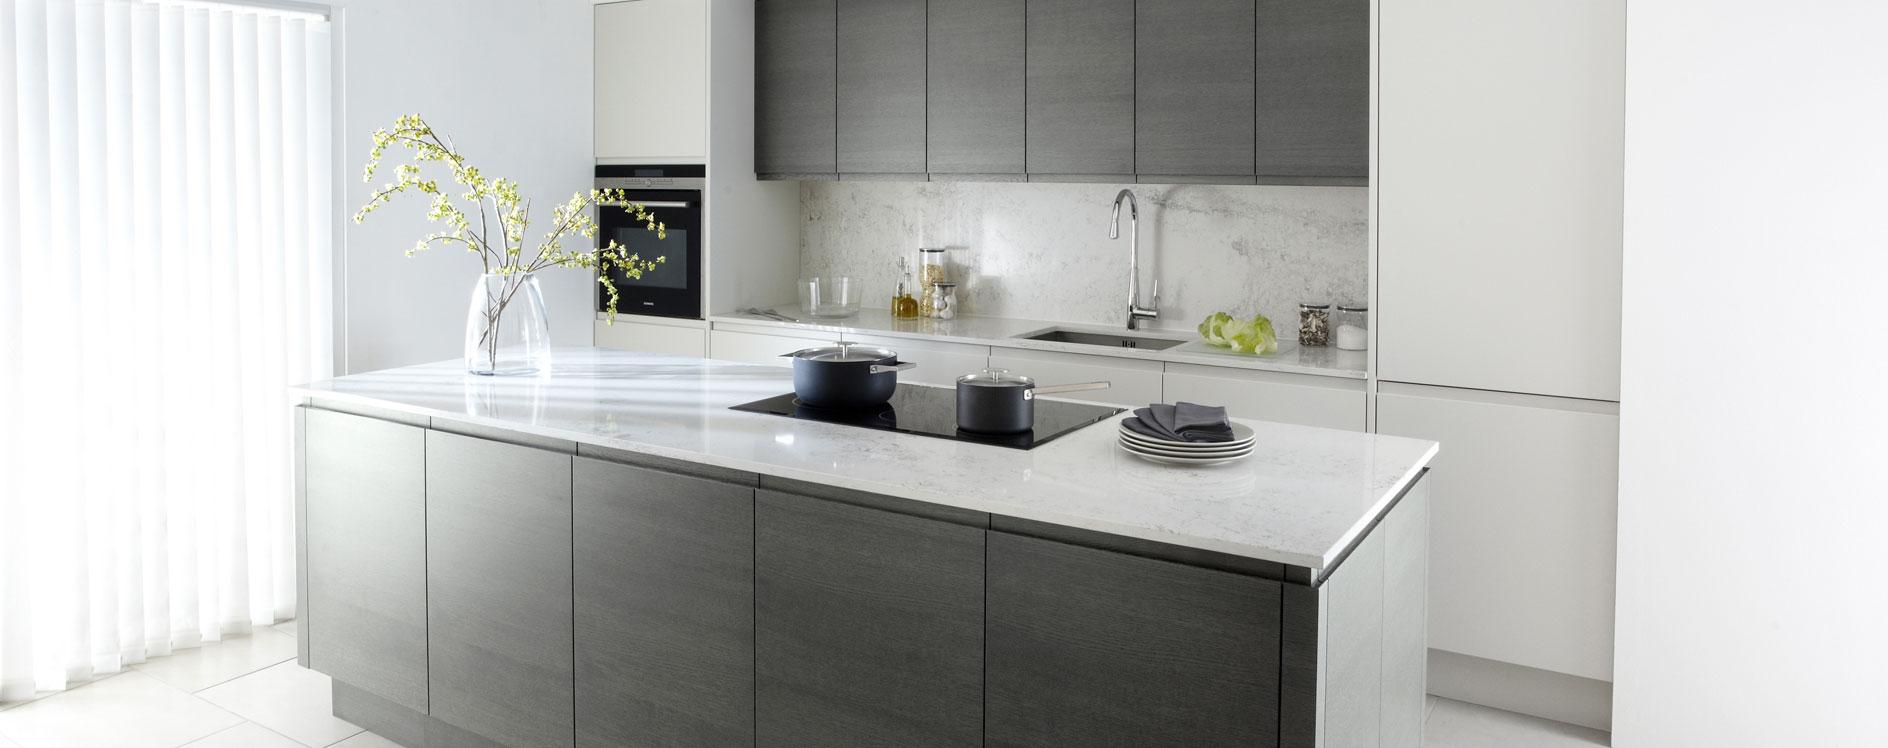 Bromsgrove Kitchen Specialists Modern Matt Malmo Kitchen - Matt grey kitchen units